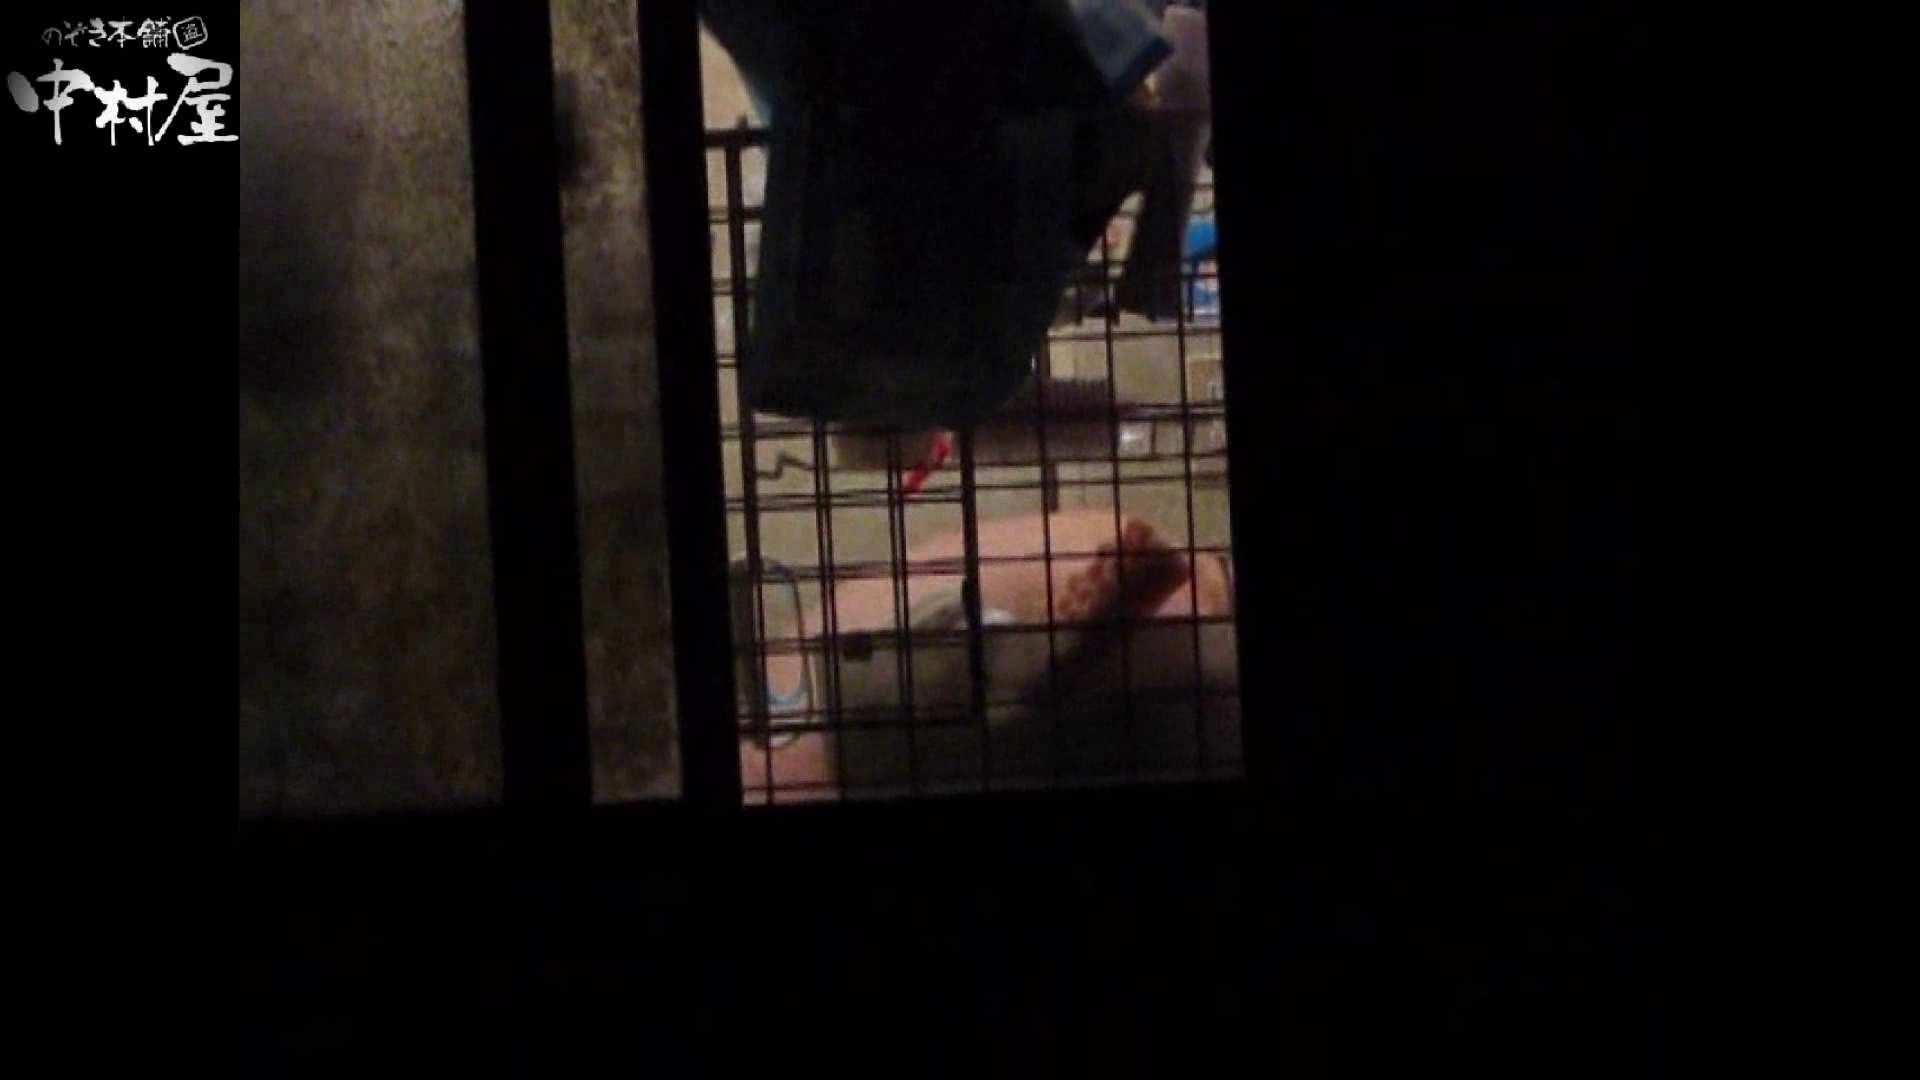 民家風呂専門盗撮師の超危険映像 vol.023 OLのエロ生活 性交動画流出 95連発 68